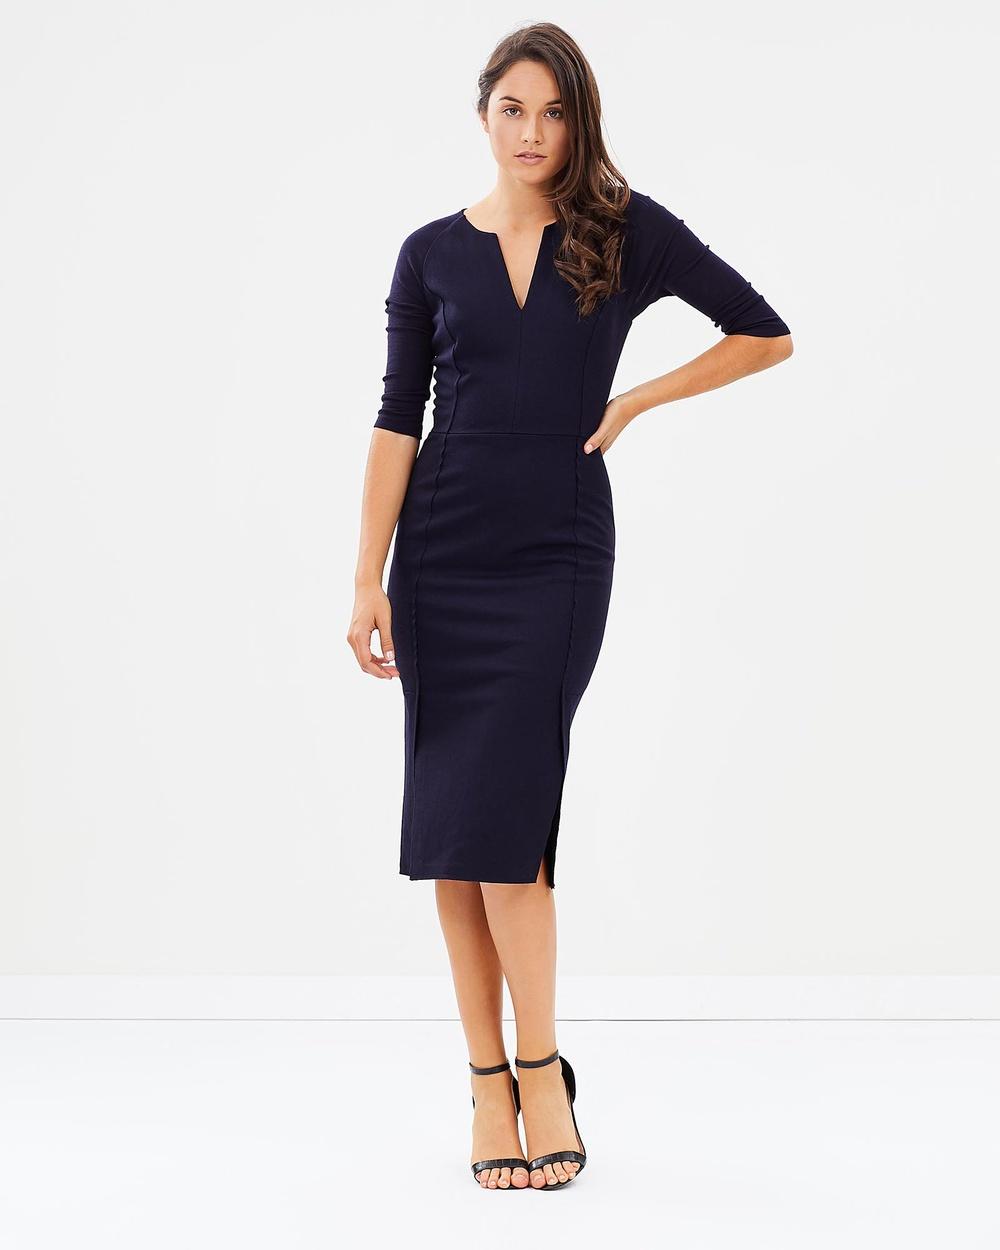 SABA Karlie Pencil Dress Dresses Navy Karlie Pencil Dress